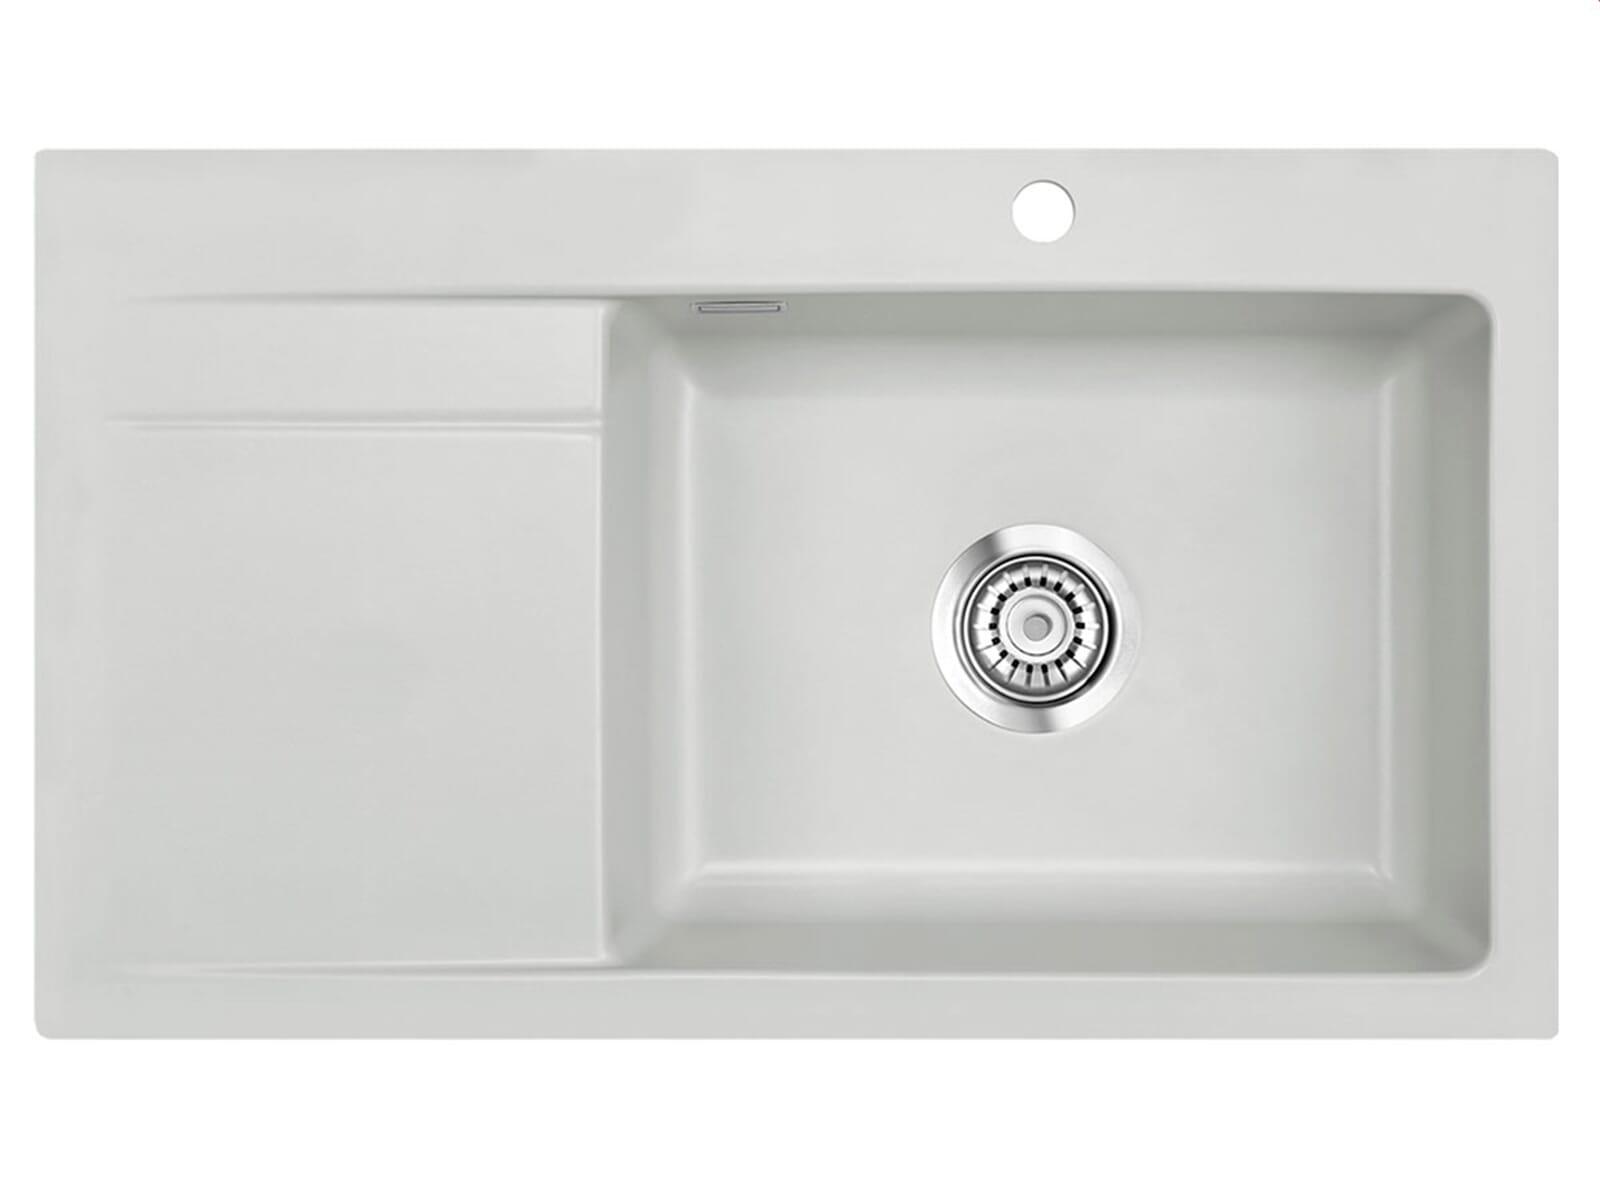 Systemceram Stema 86 SL Alu Keramikspüle Handbetätigung